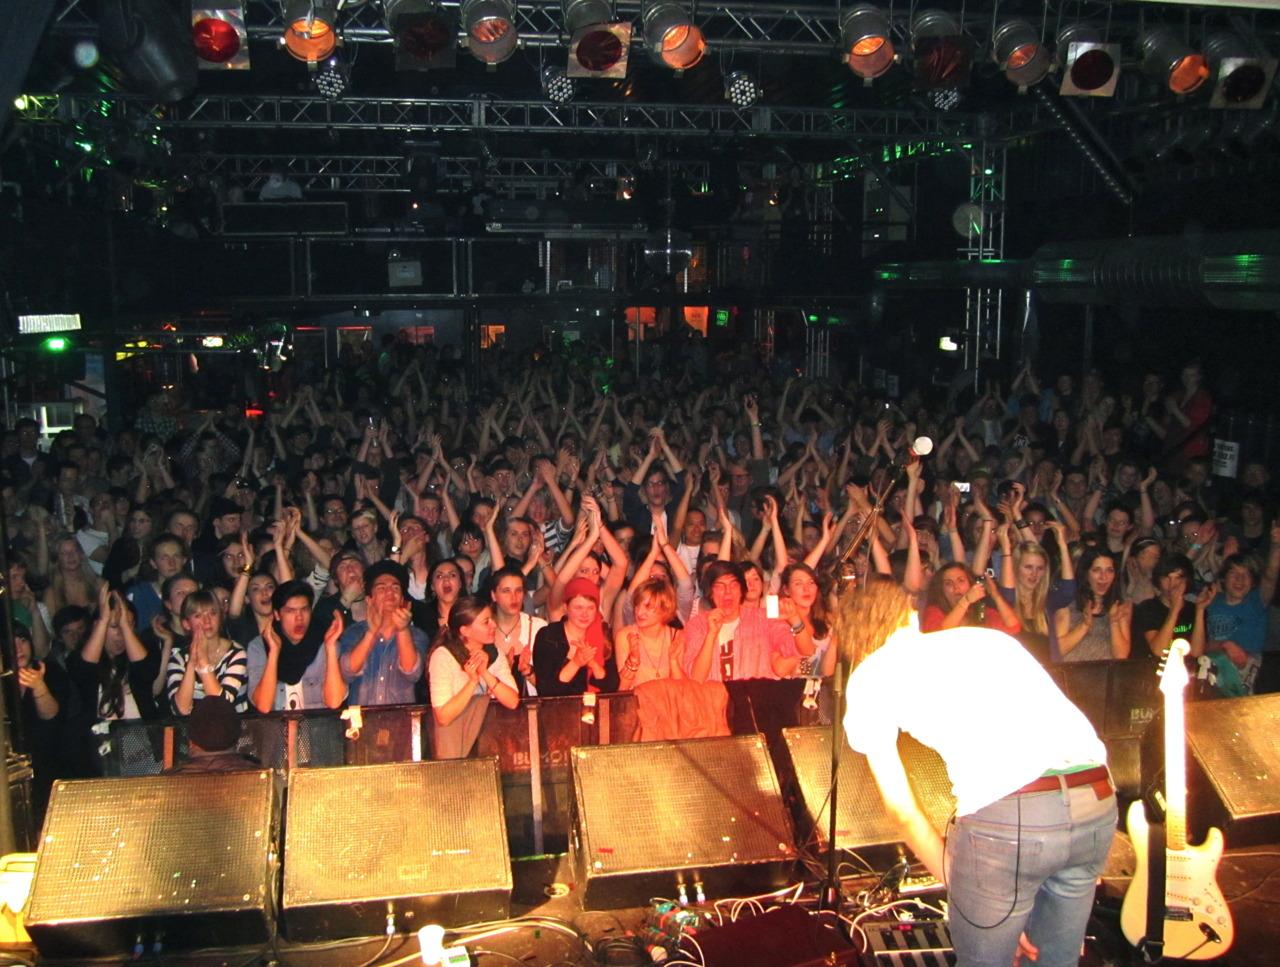 Audience, Backstage. München, Germany